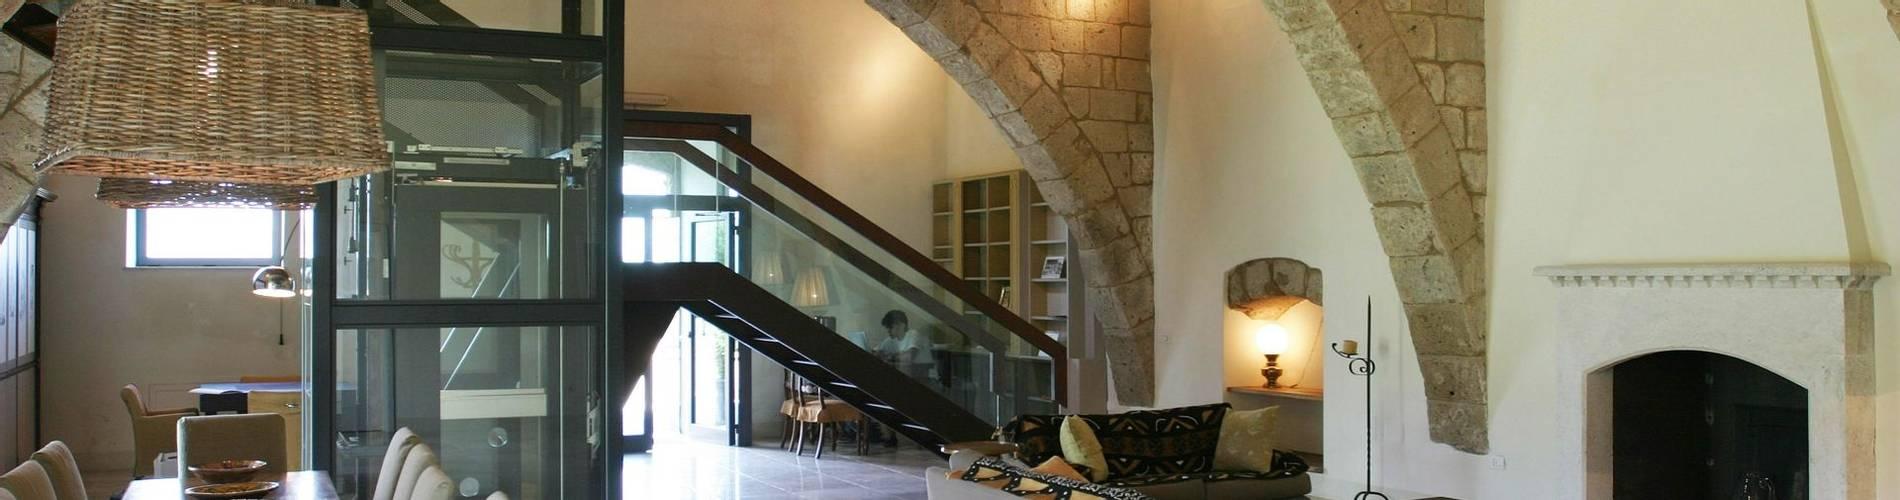 Locanda Palazzone, Umbria, Italy (14).jpg